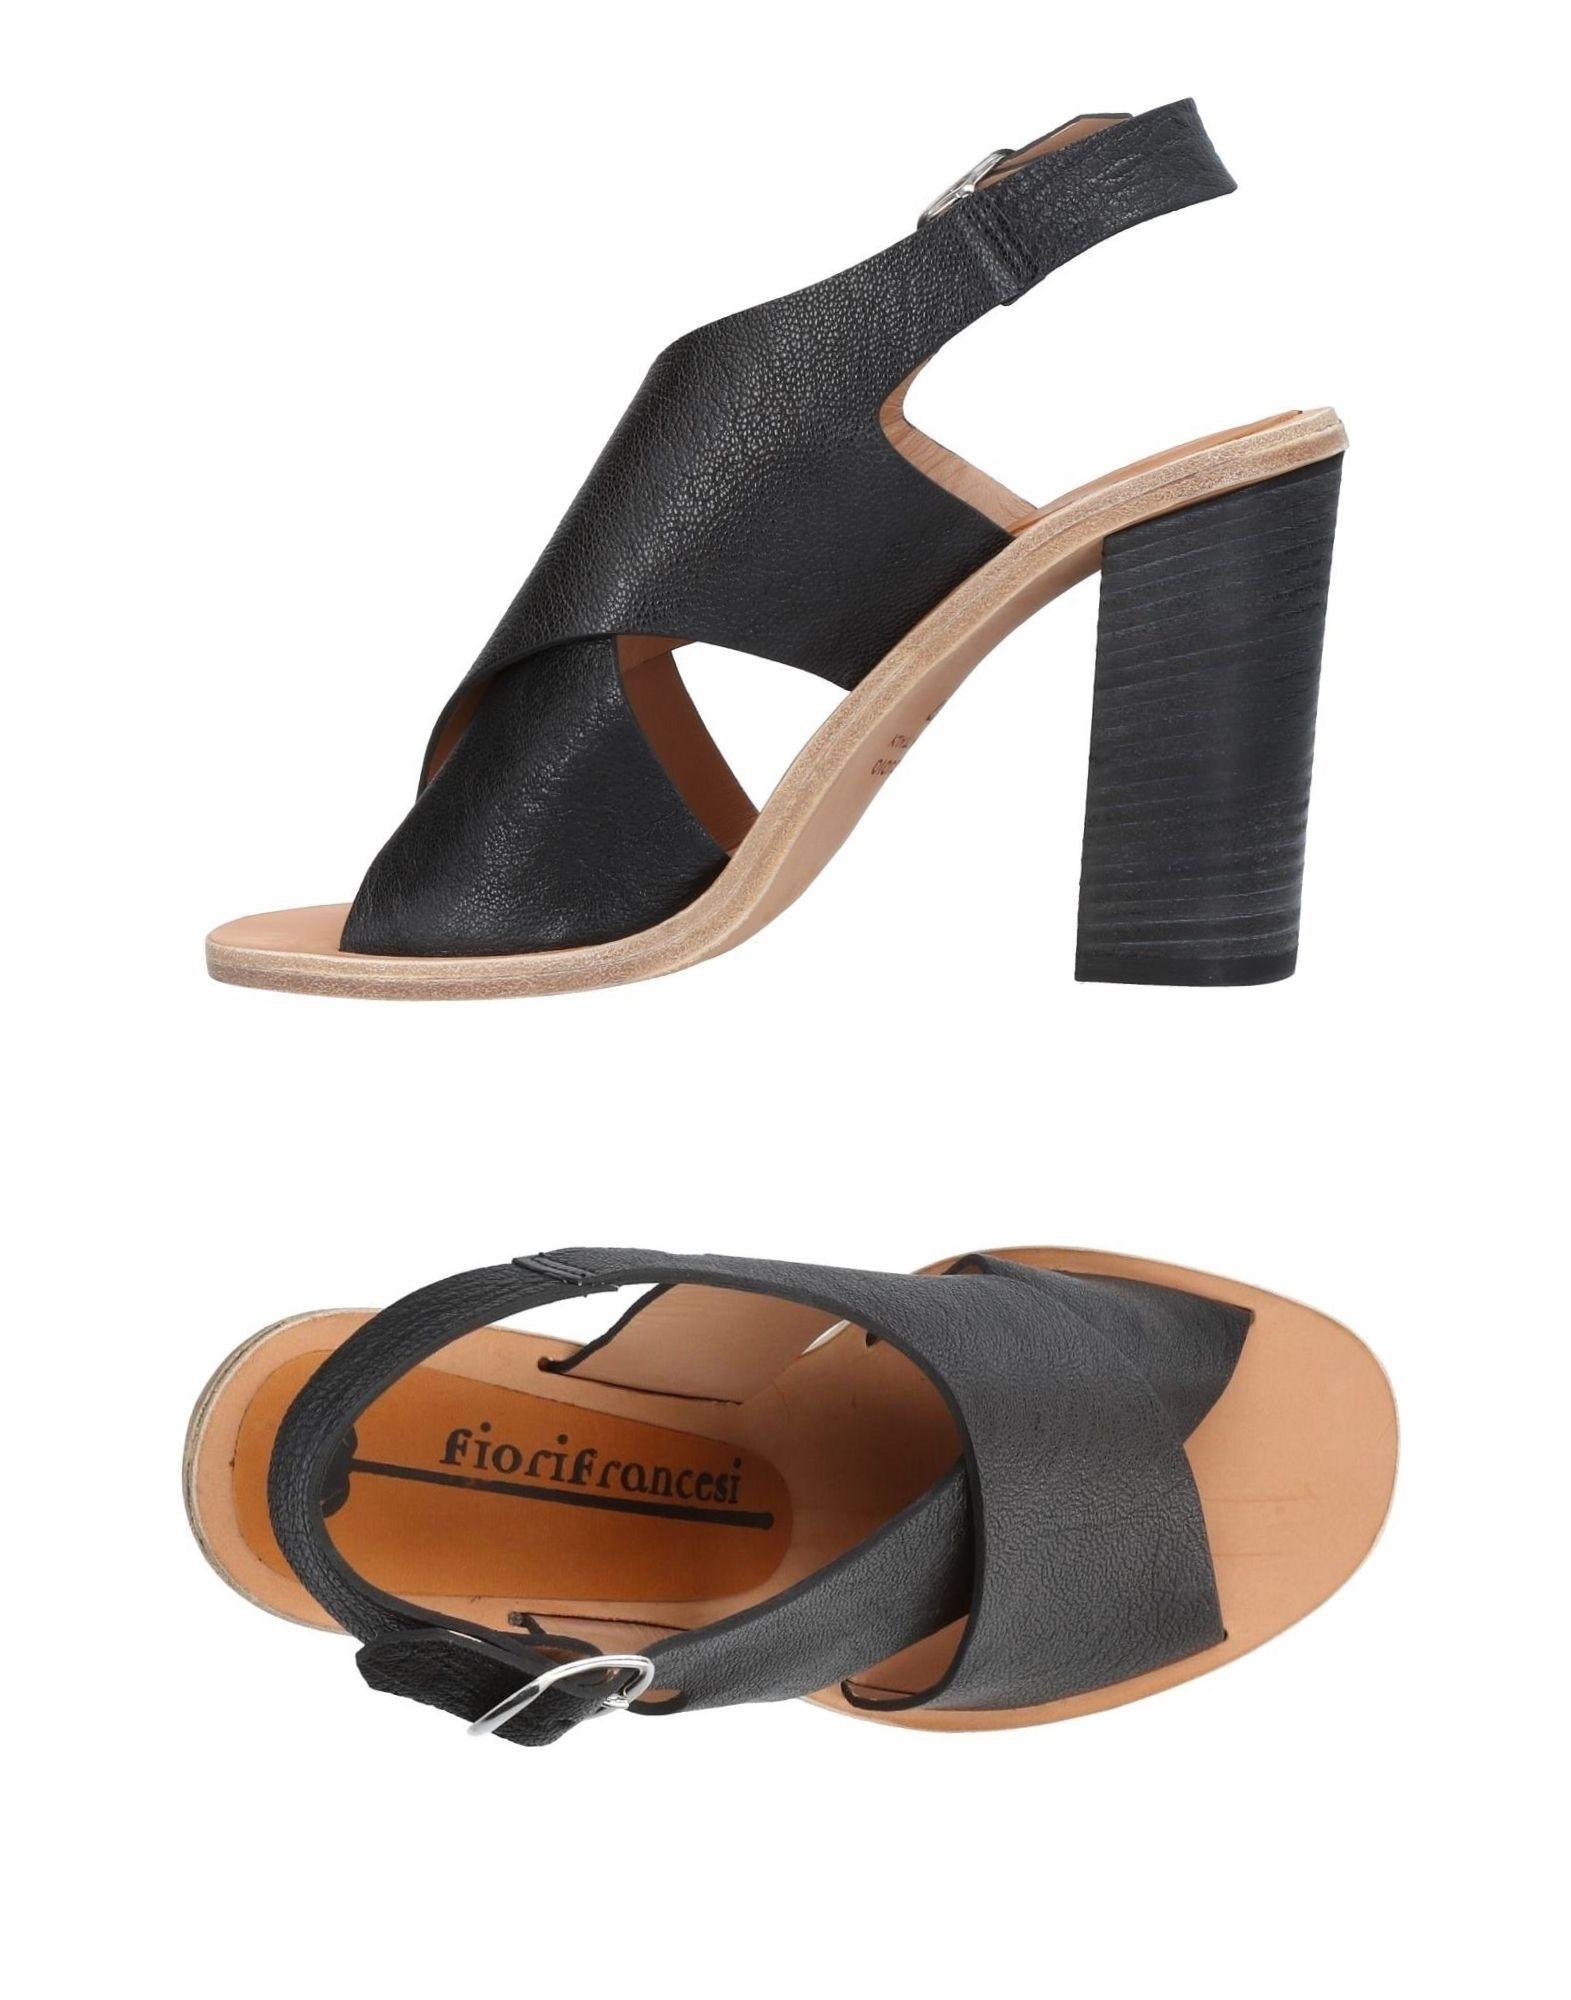 Fiorifrancesi Sandalen Damen  11419337WC Gute Qualität beliebte Schuhe